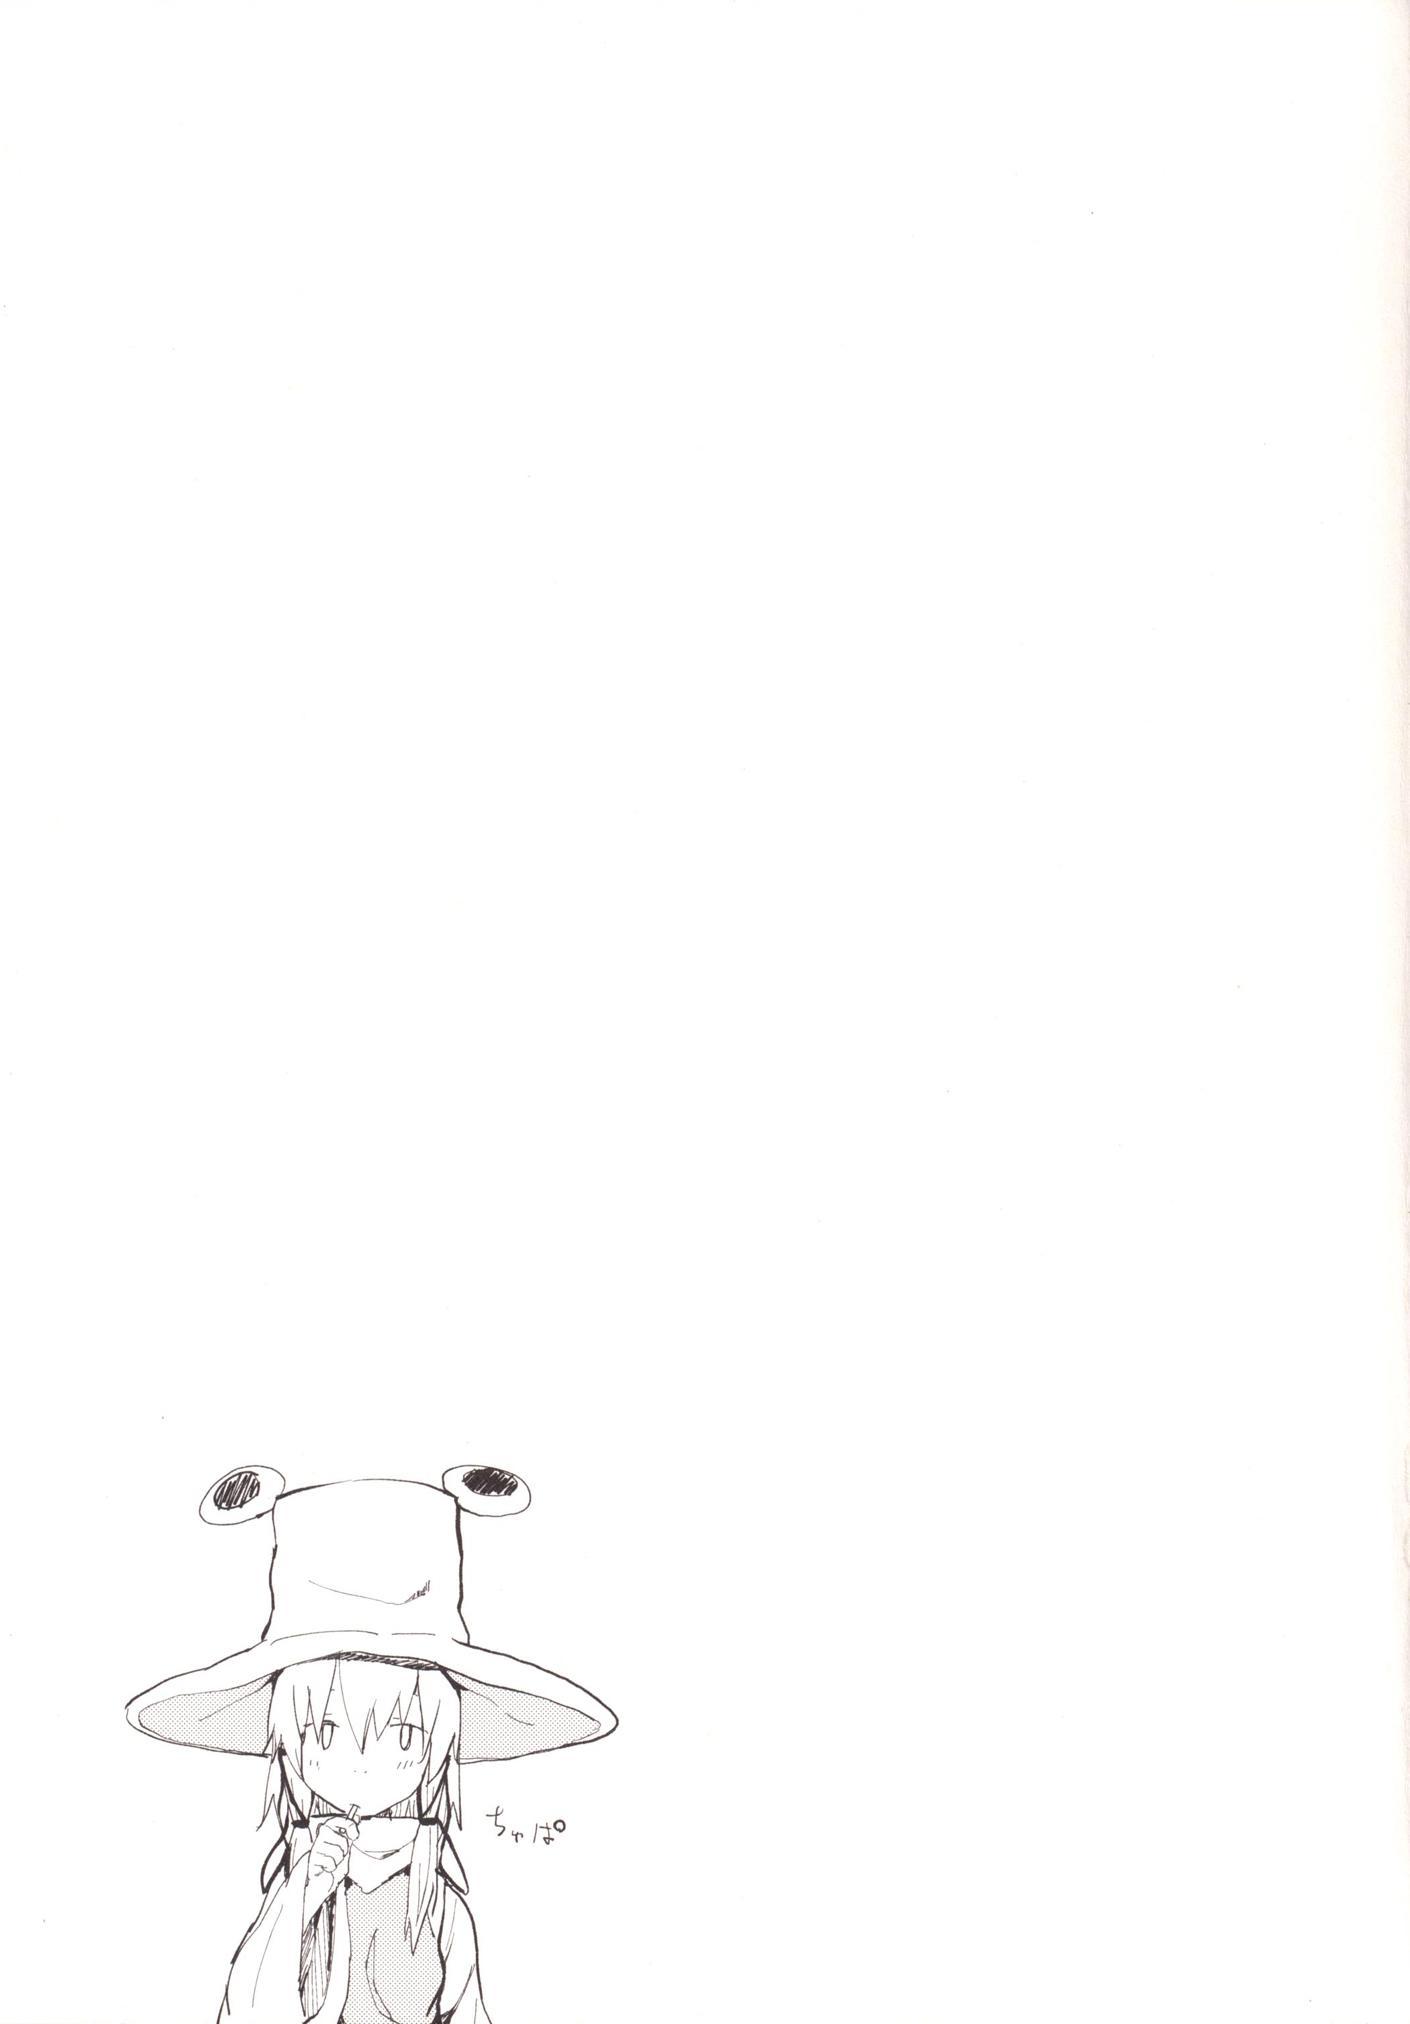 Suwa Shota Tsumeawase Suwa Shota Bangaihen 6 17